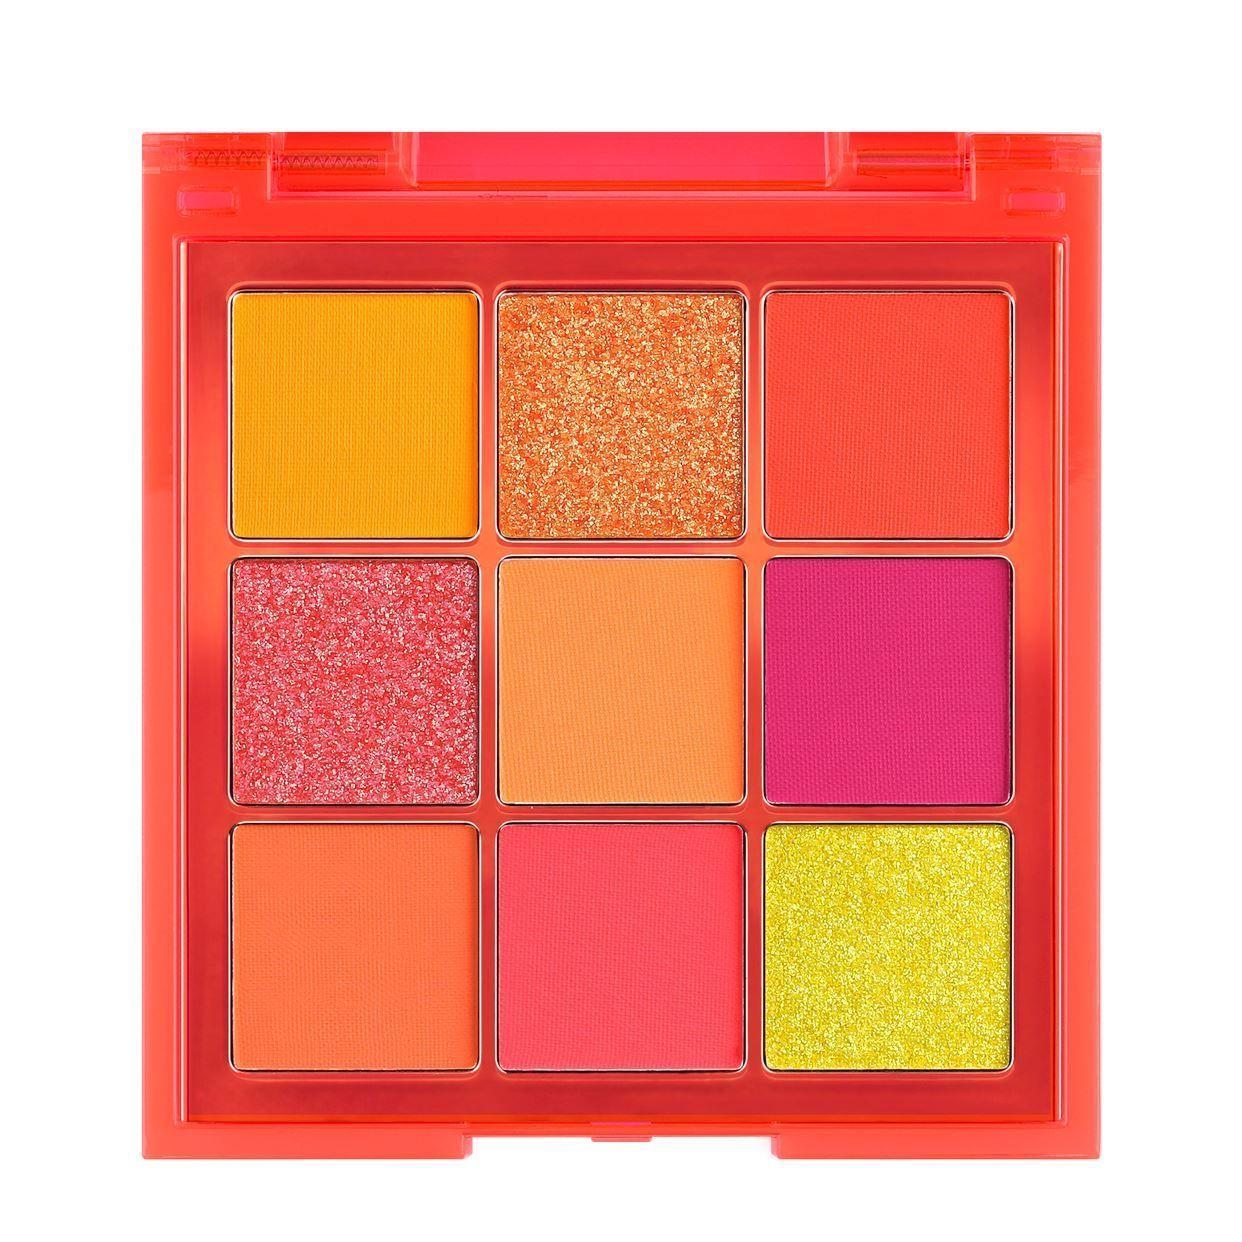 Neon Obsessions Eye Palette - Neon Orange